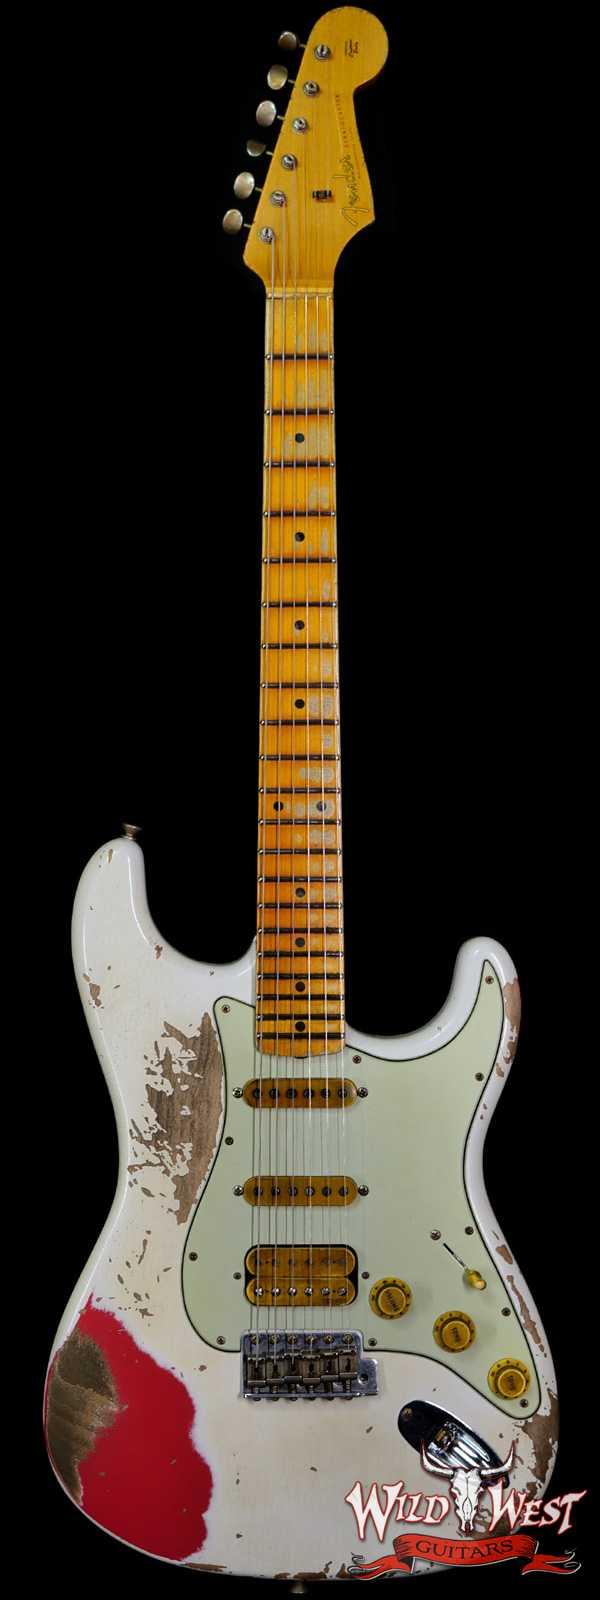 Fender Custom Shop Wild West White Lightning Stratocaster 2.0 Heavy Relic Maple Board Fiesta Red